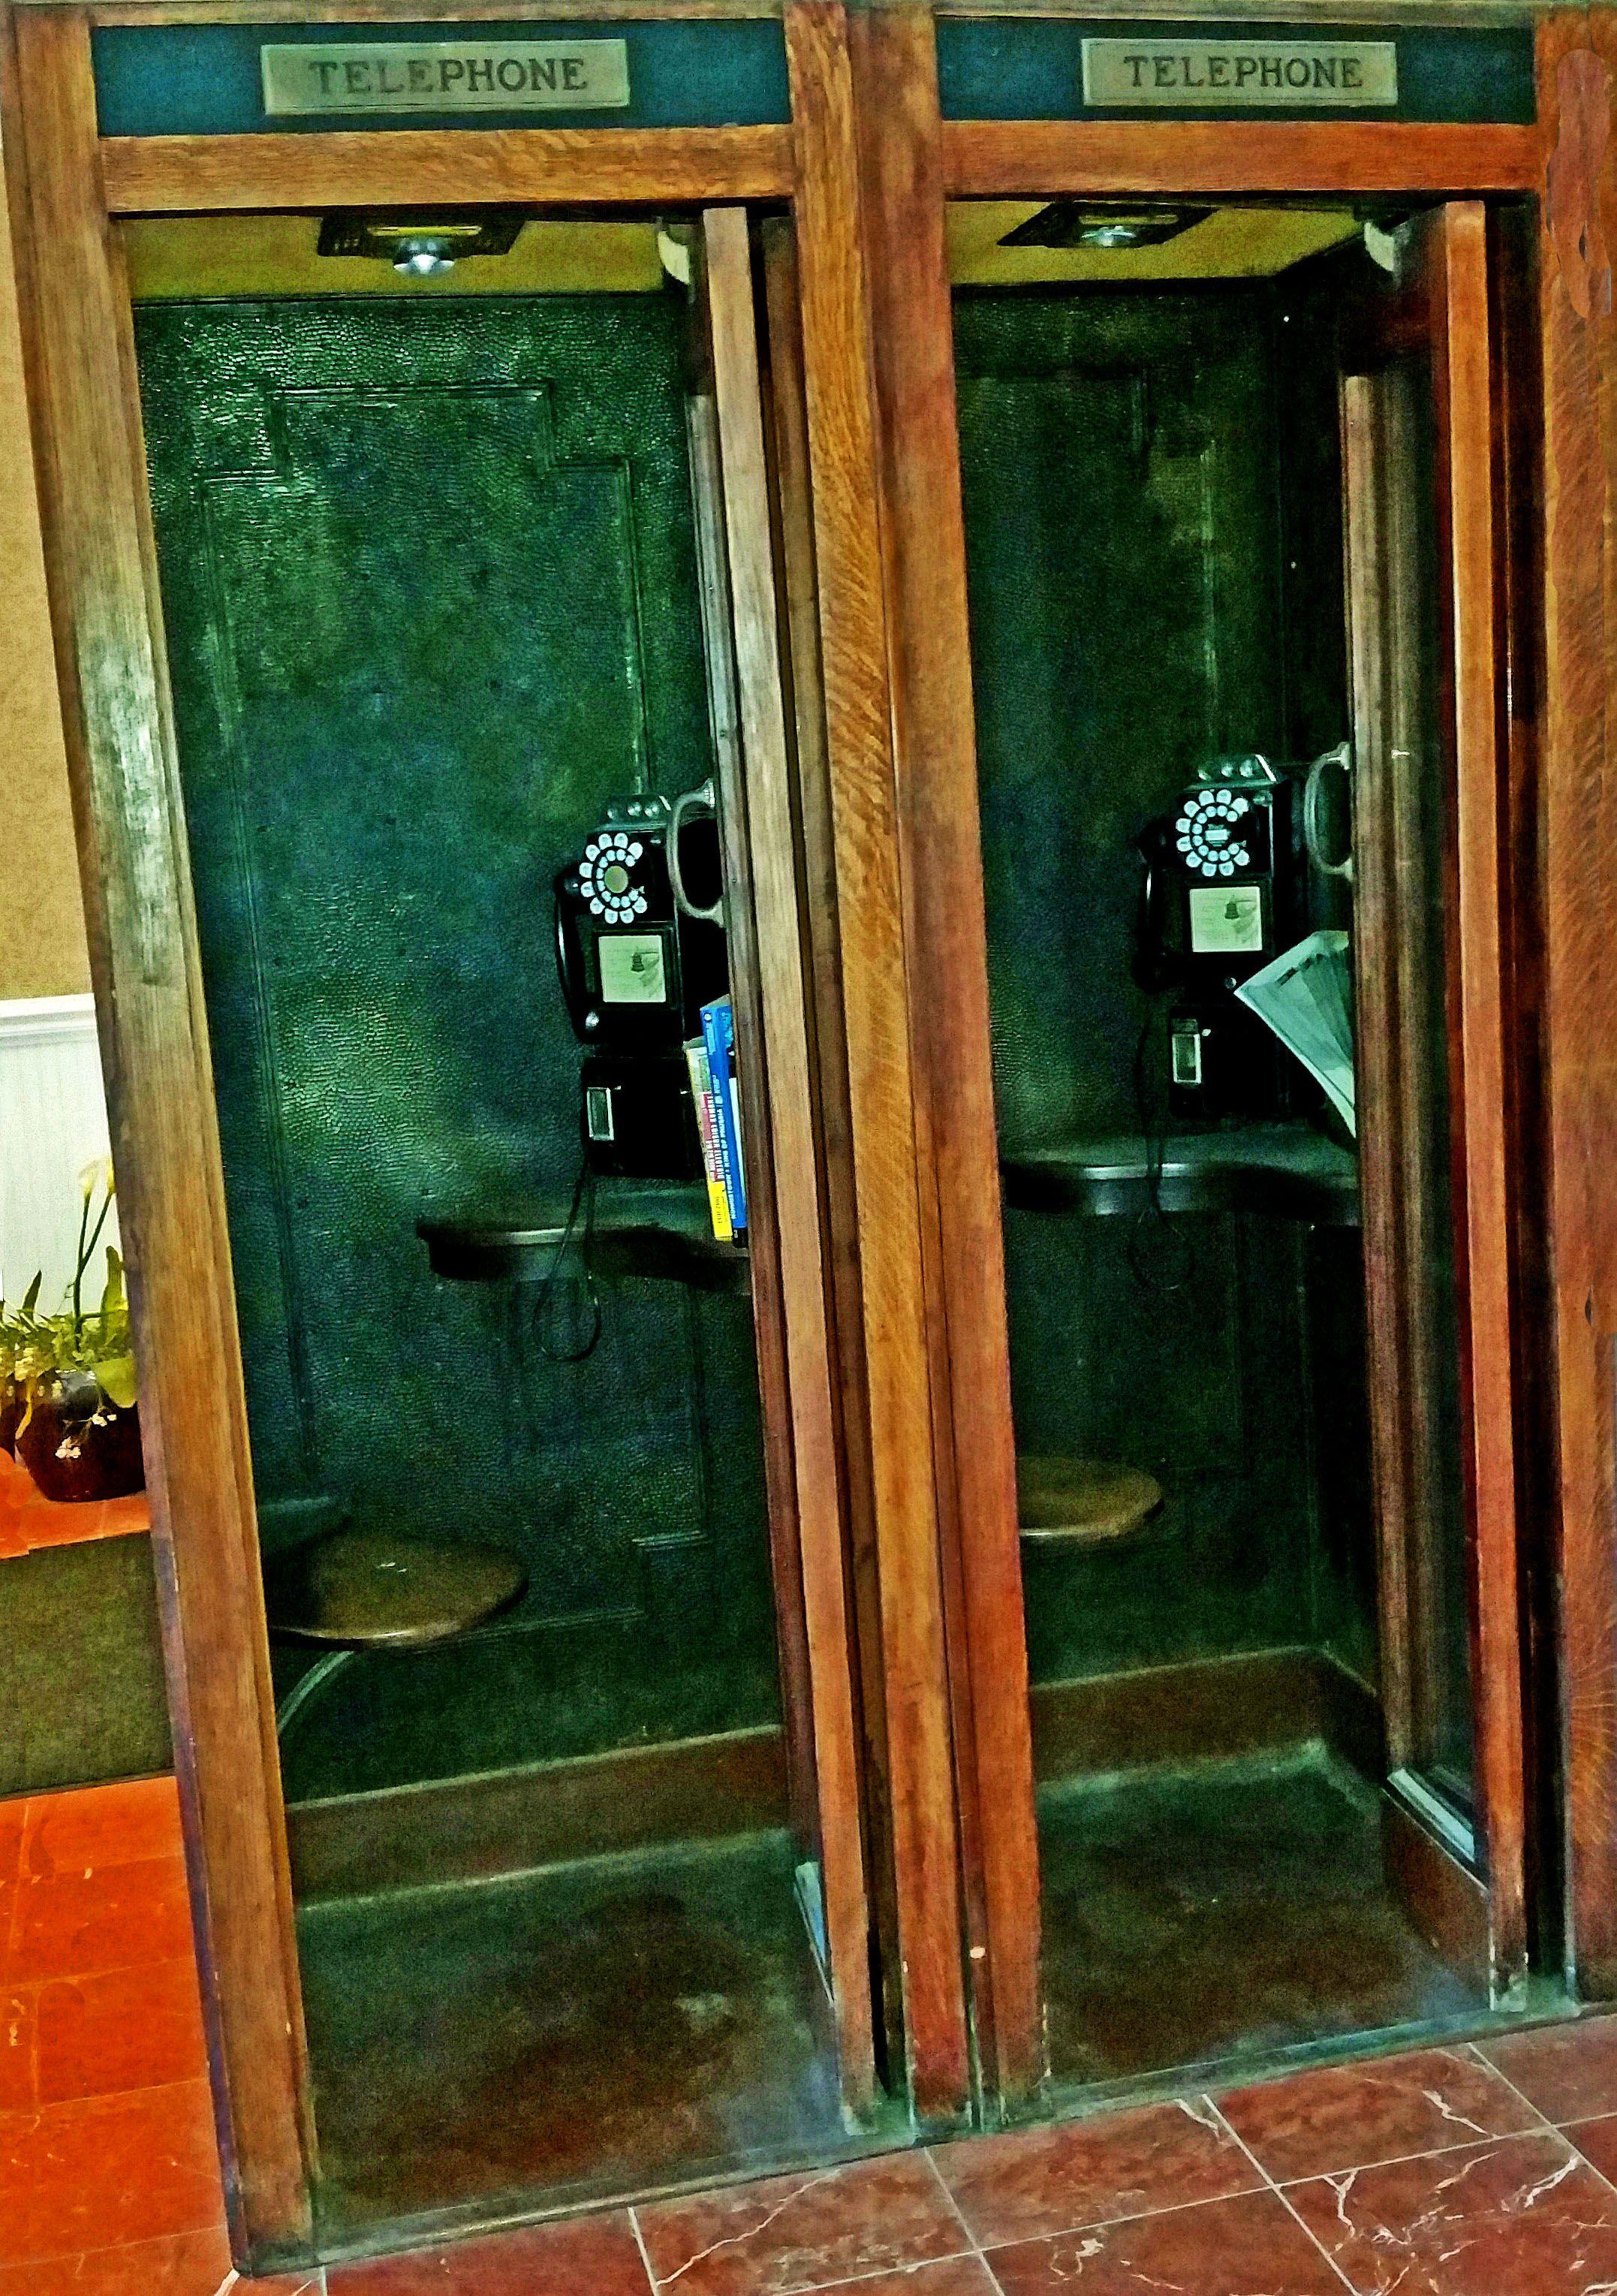 Vintage Phone Booths Retro phone, Phone booth, Vintage